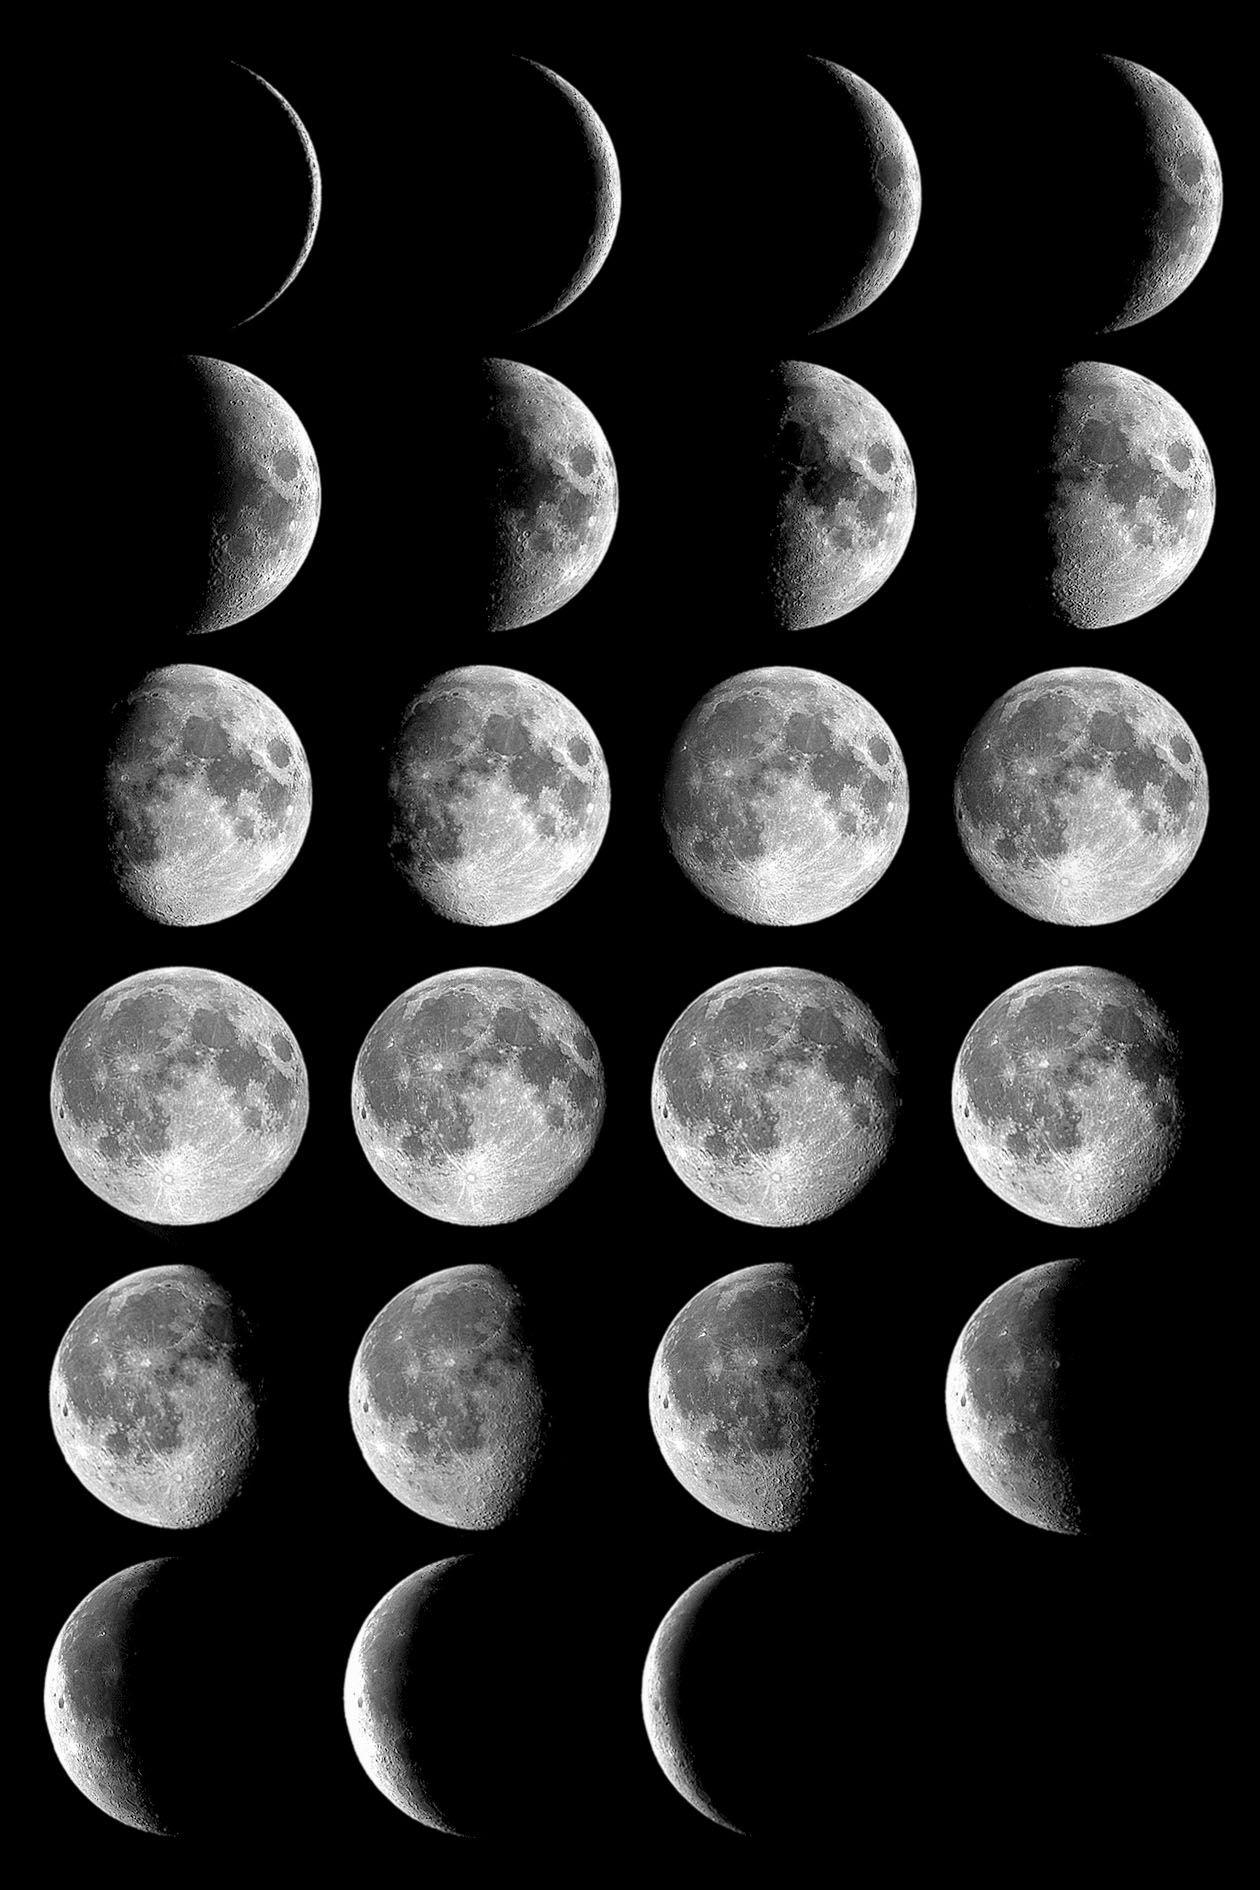 Moon phase flip book httplpiraeducationspacedays moon phase flip book httplpiraeducationspacedaysactivitiesmoon documentsmoonphasesflipbookpdf fandeluxe Choice Image